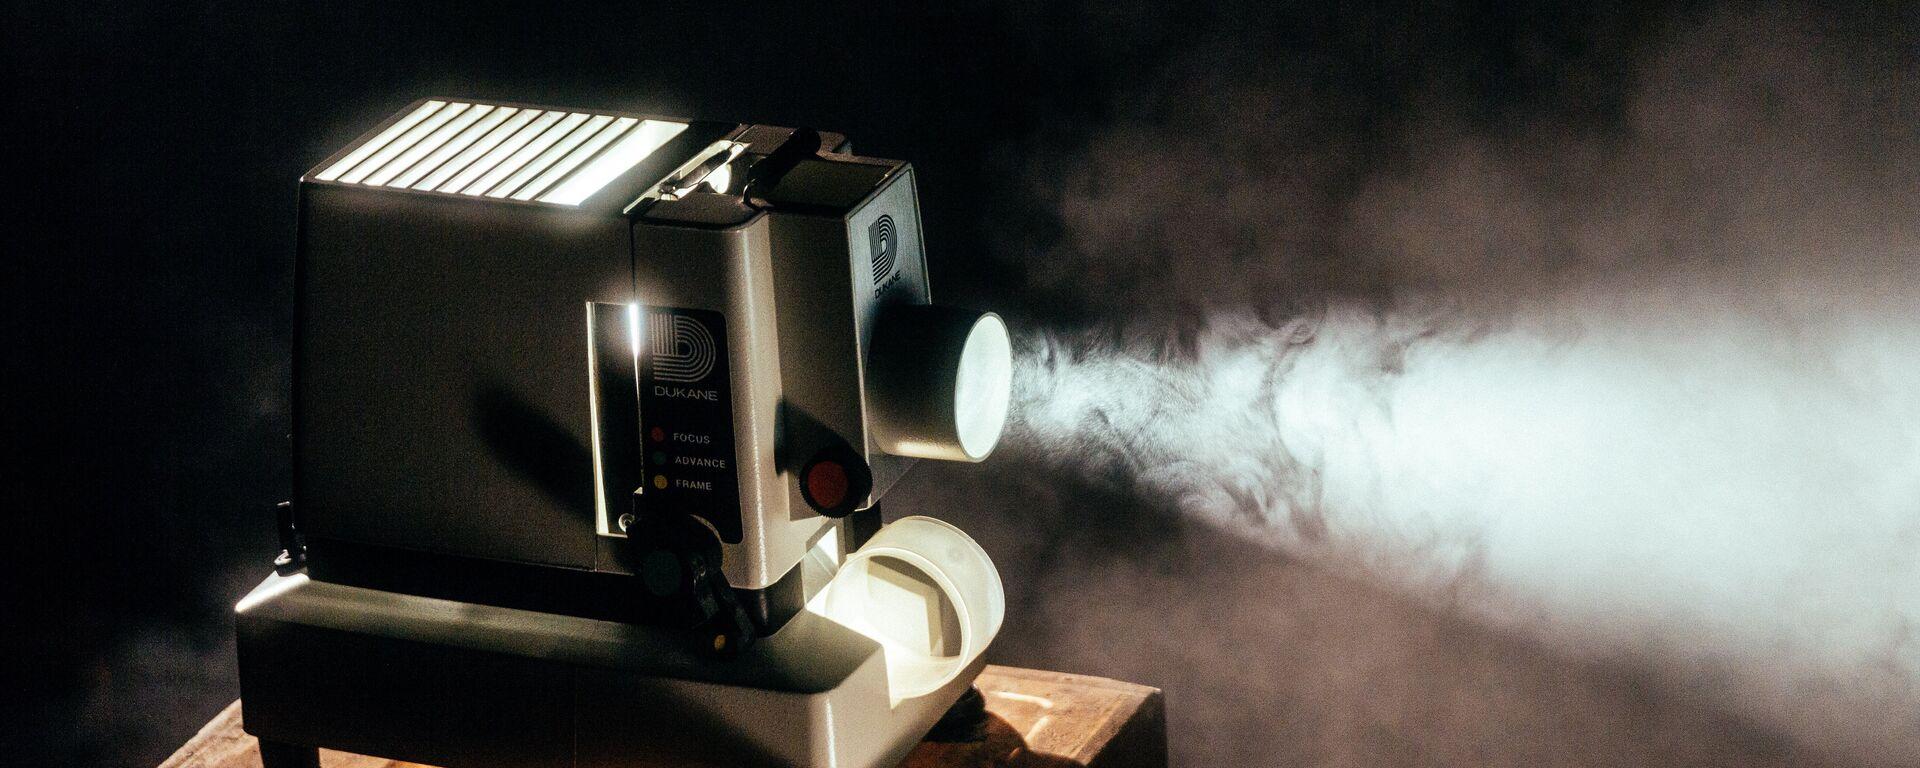 Proyector de cine (imagen referencial) - Sputnik Mundo, 1920, 14.09.2021